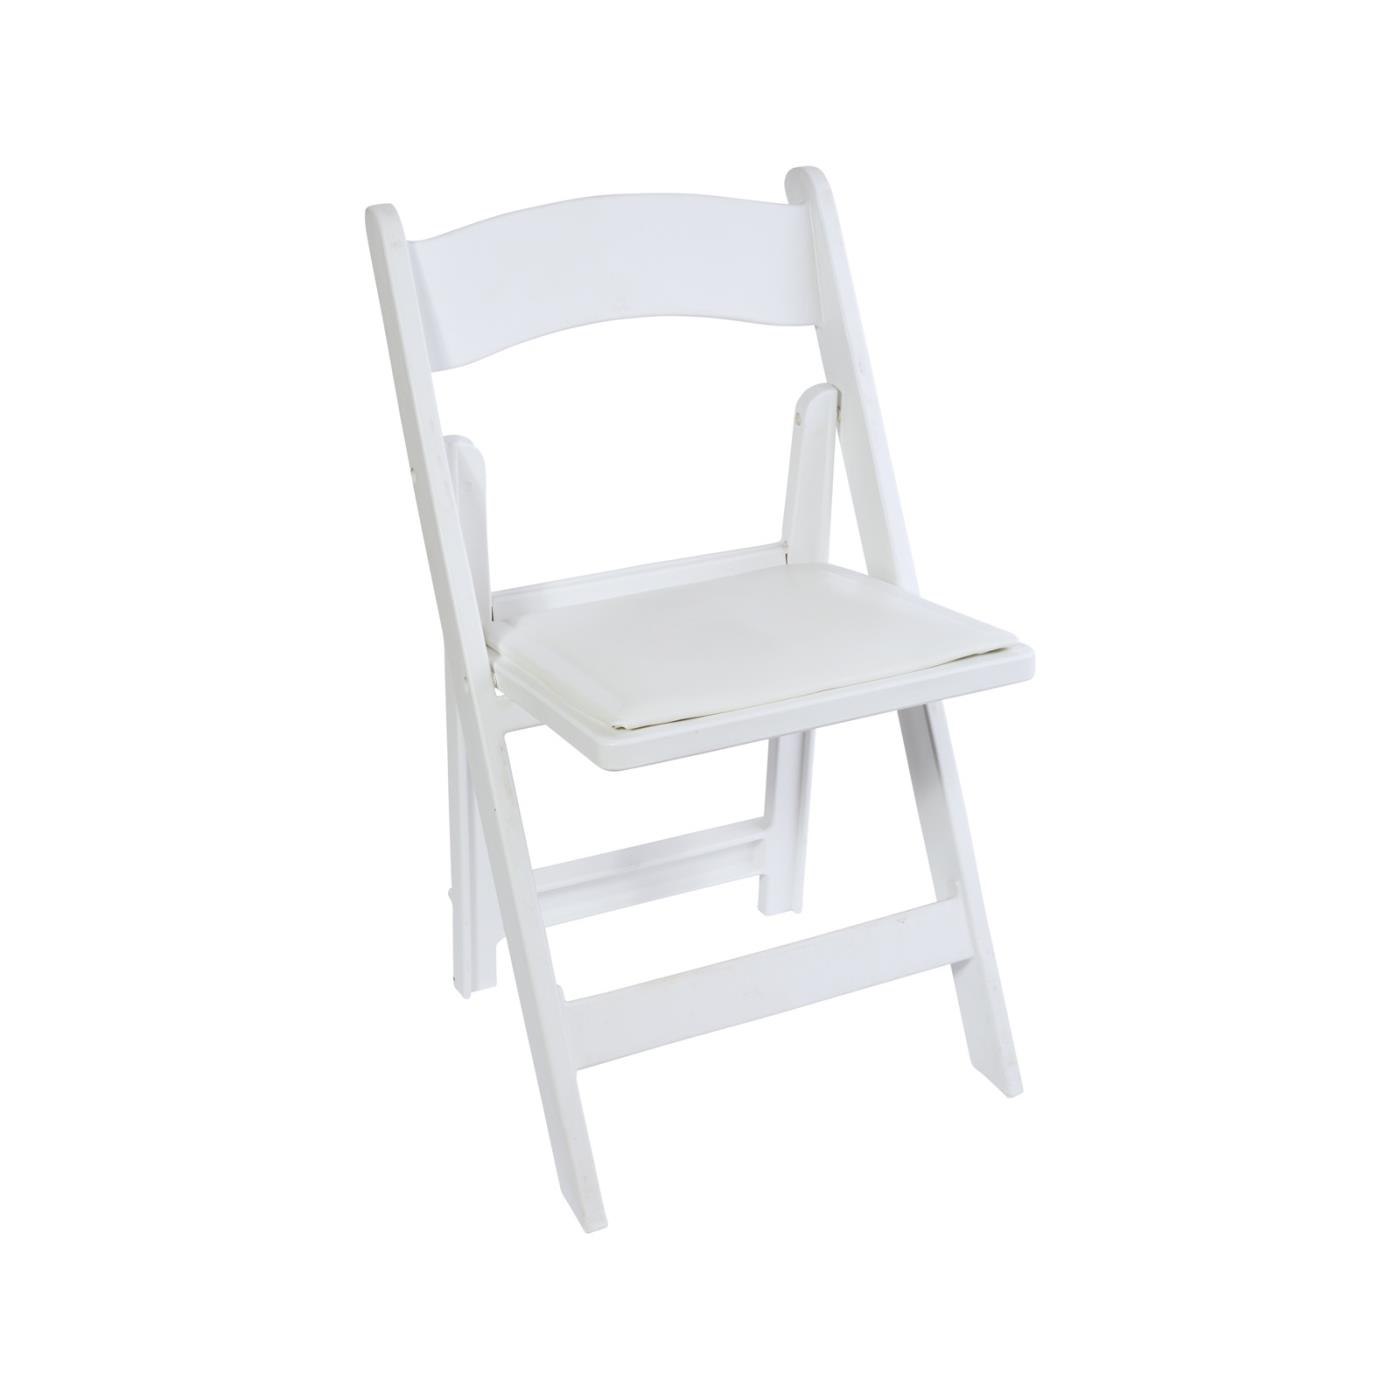 Resin Folding Chair - White